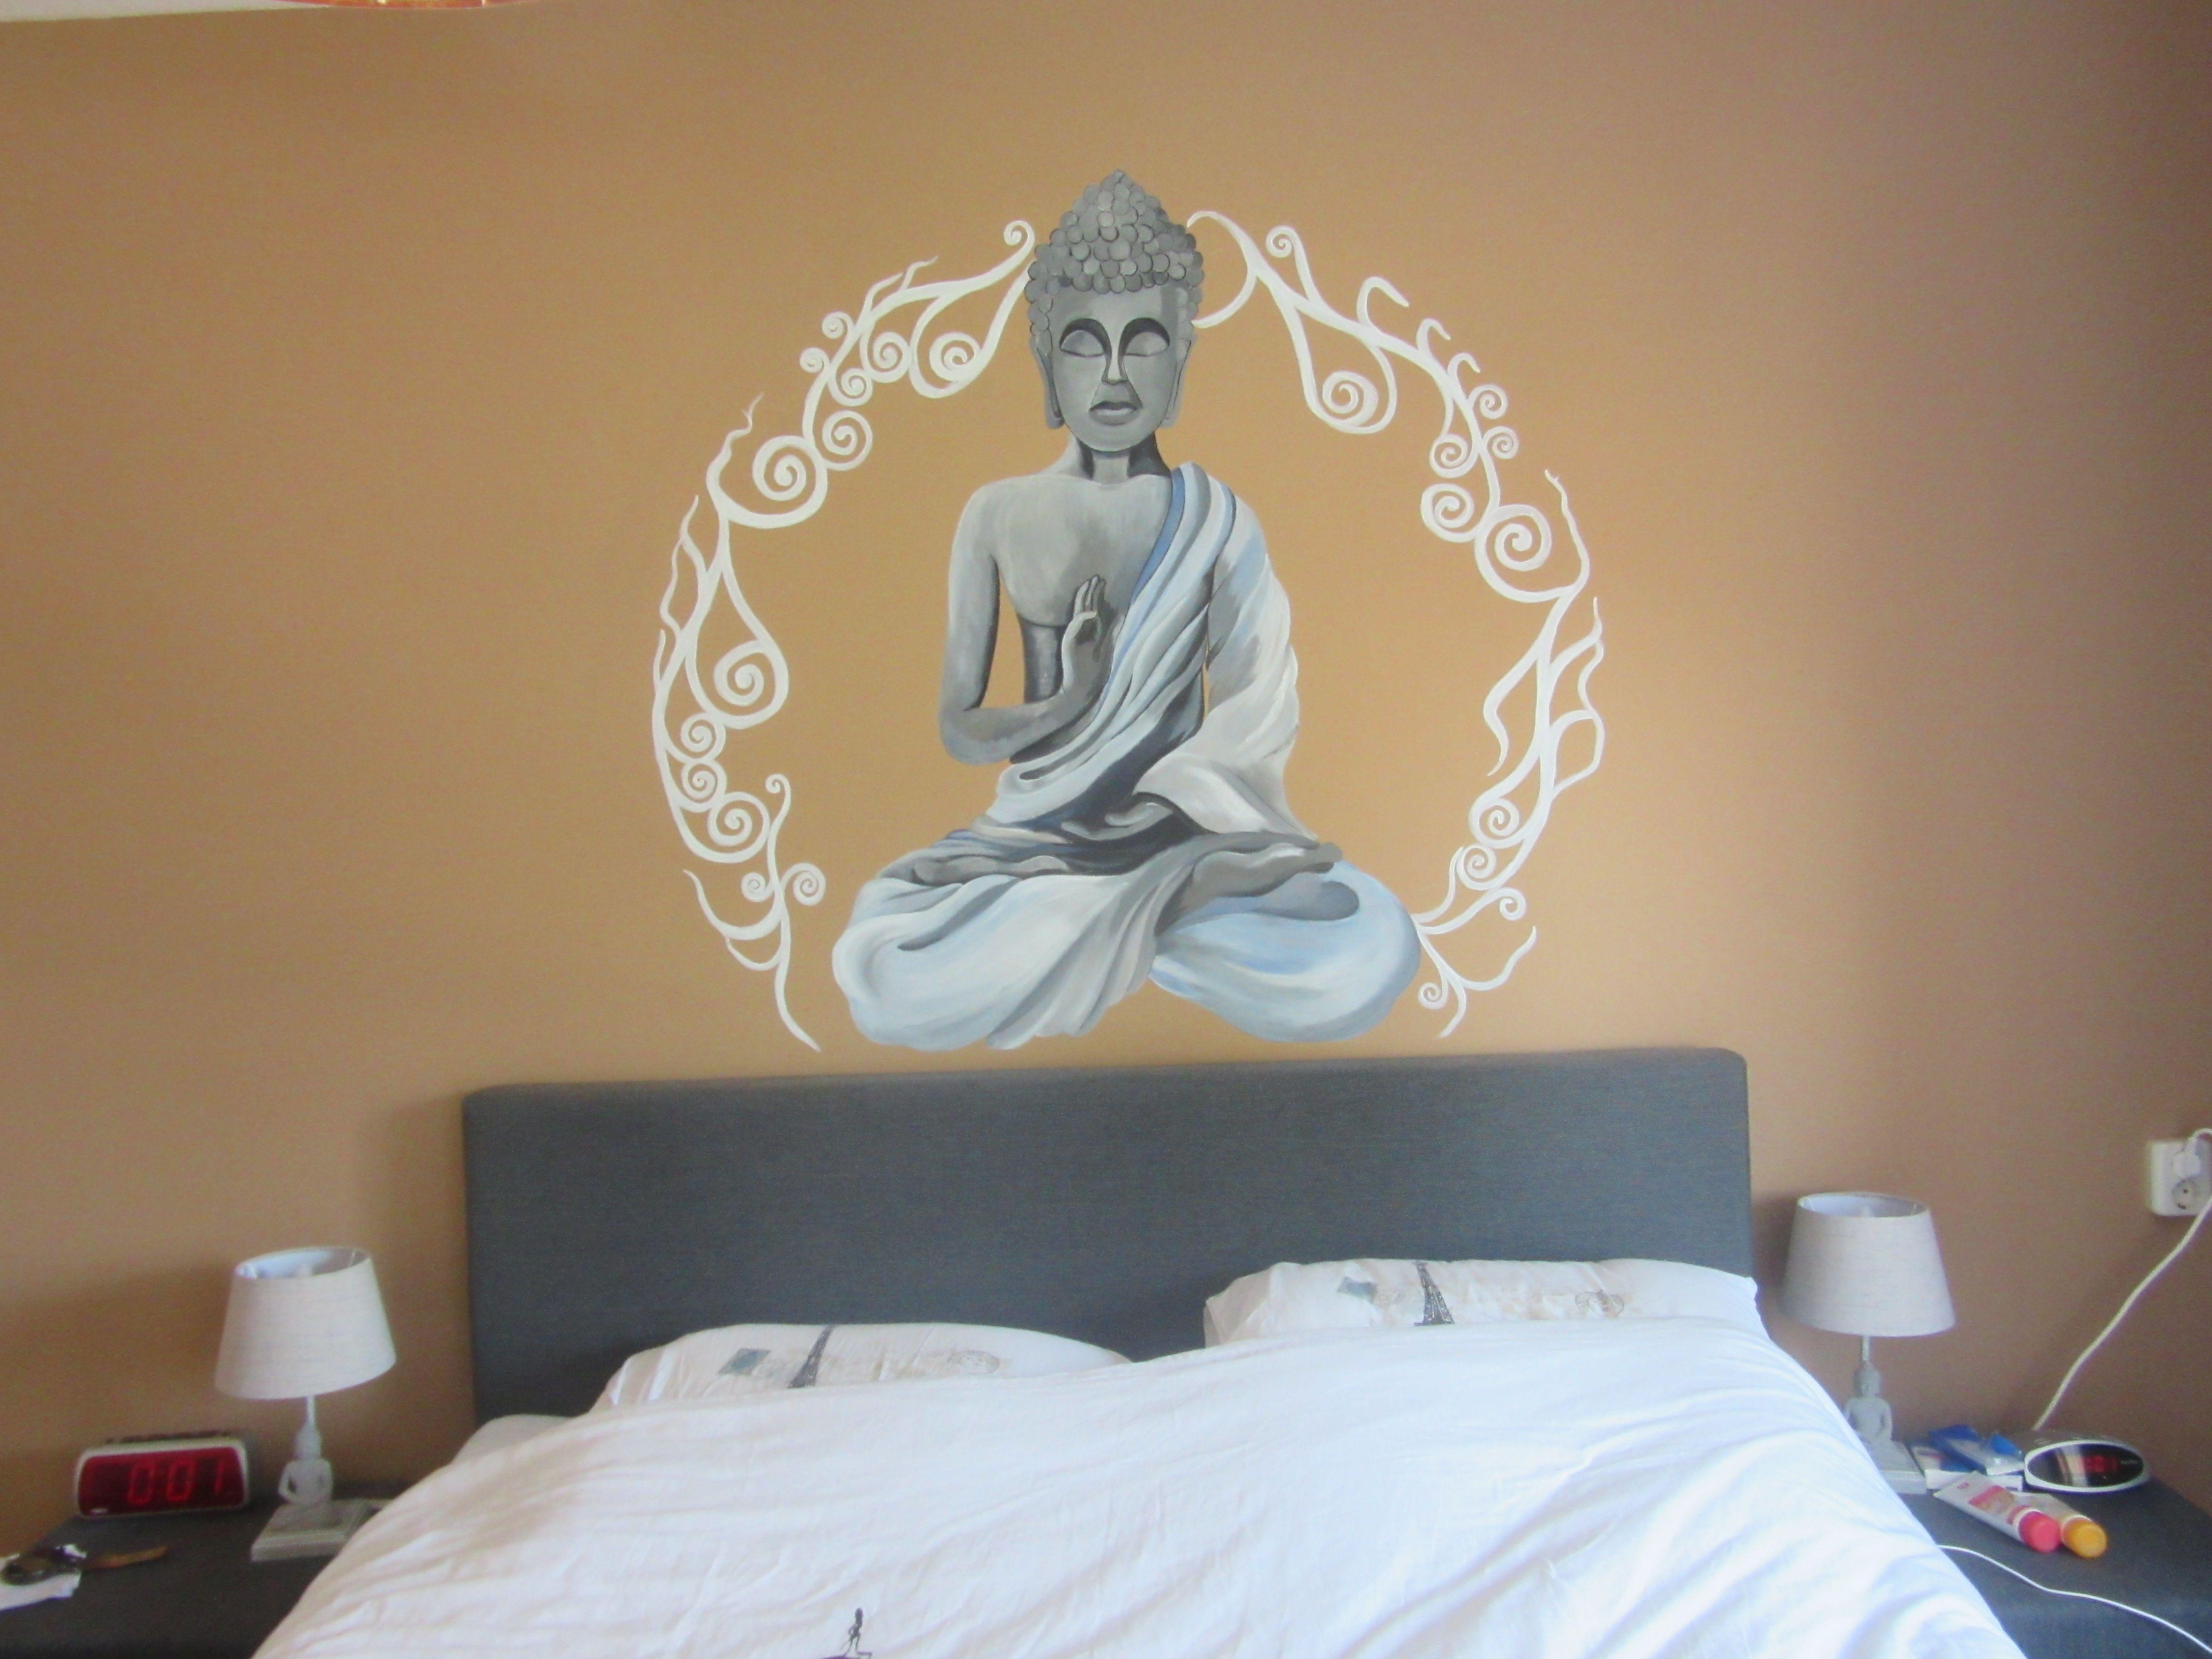 mural acrylic buddha bedroom religion decoration adult wall art ...